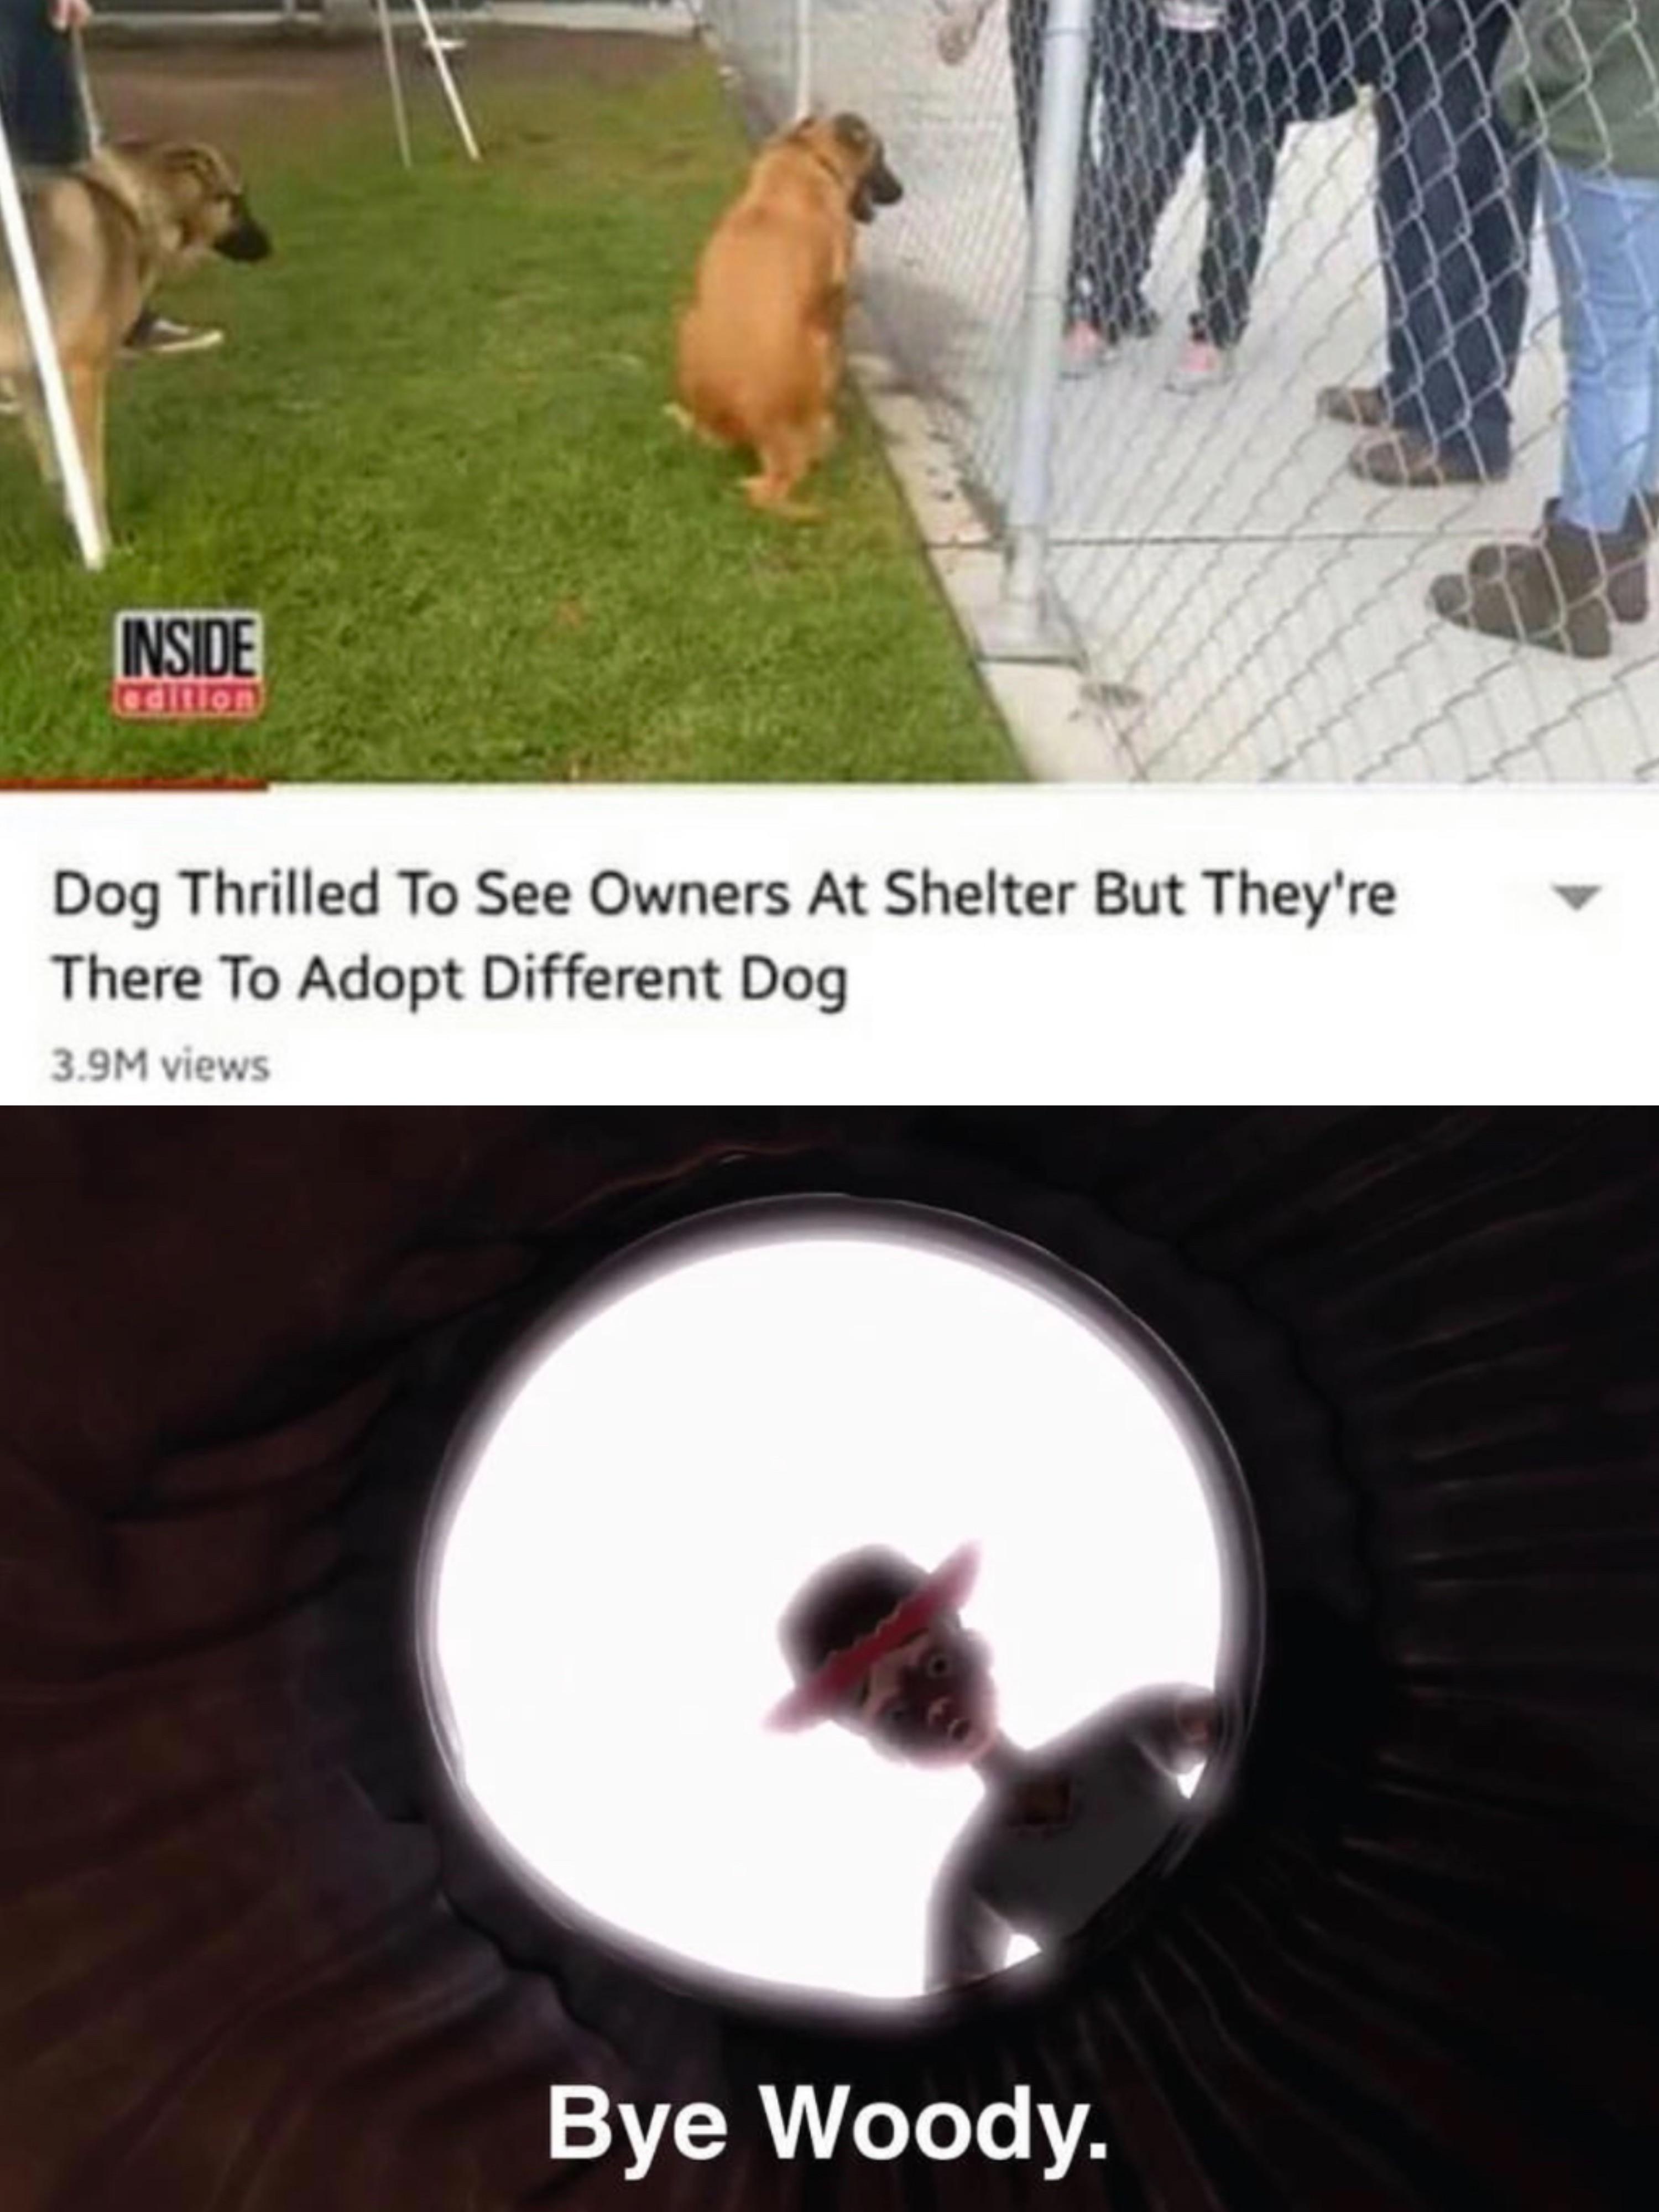 Bye Dog Meme : Woody, Memes